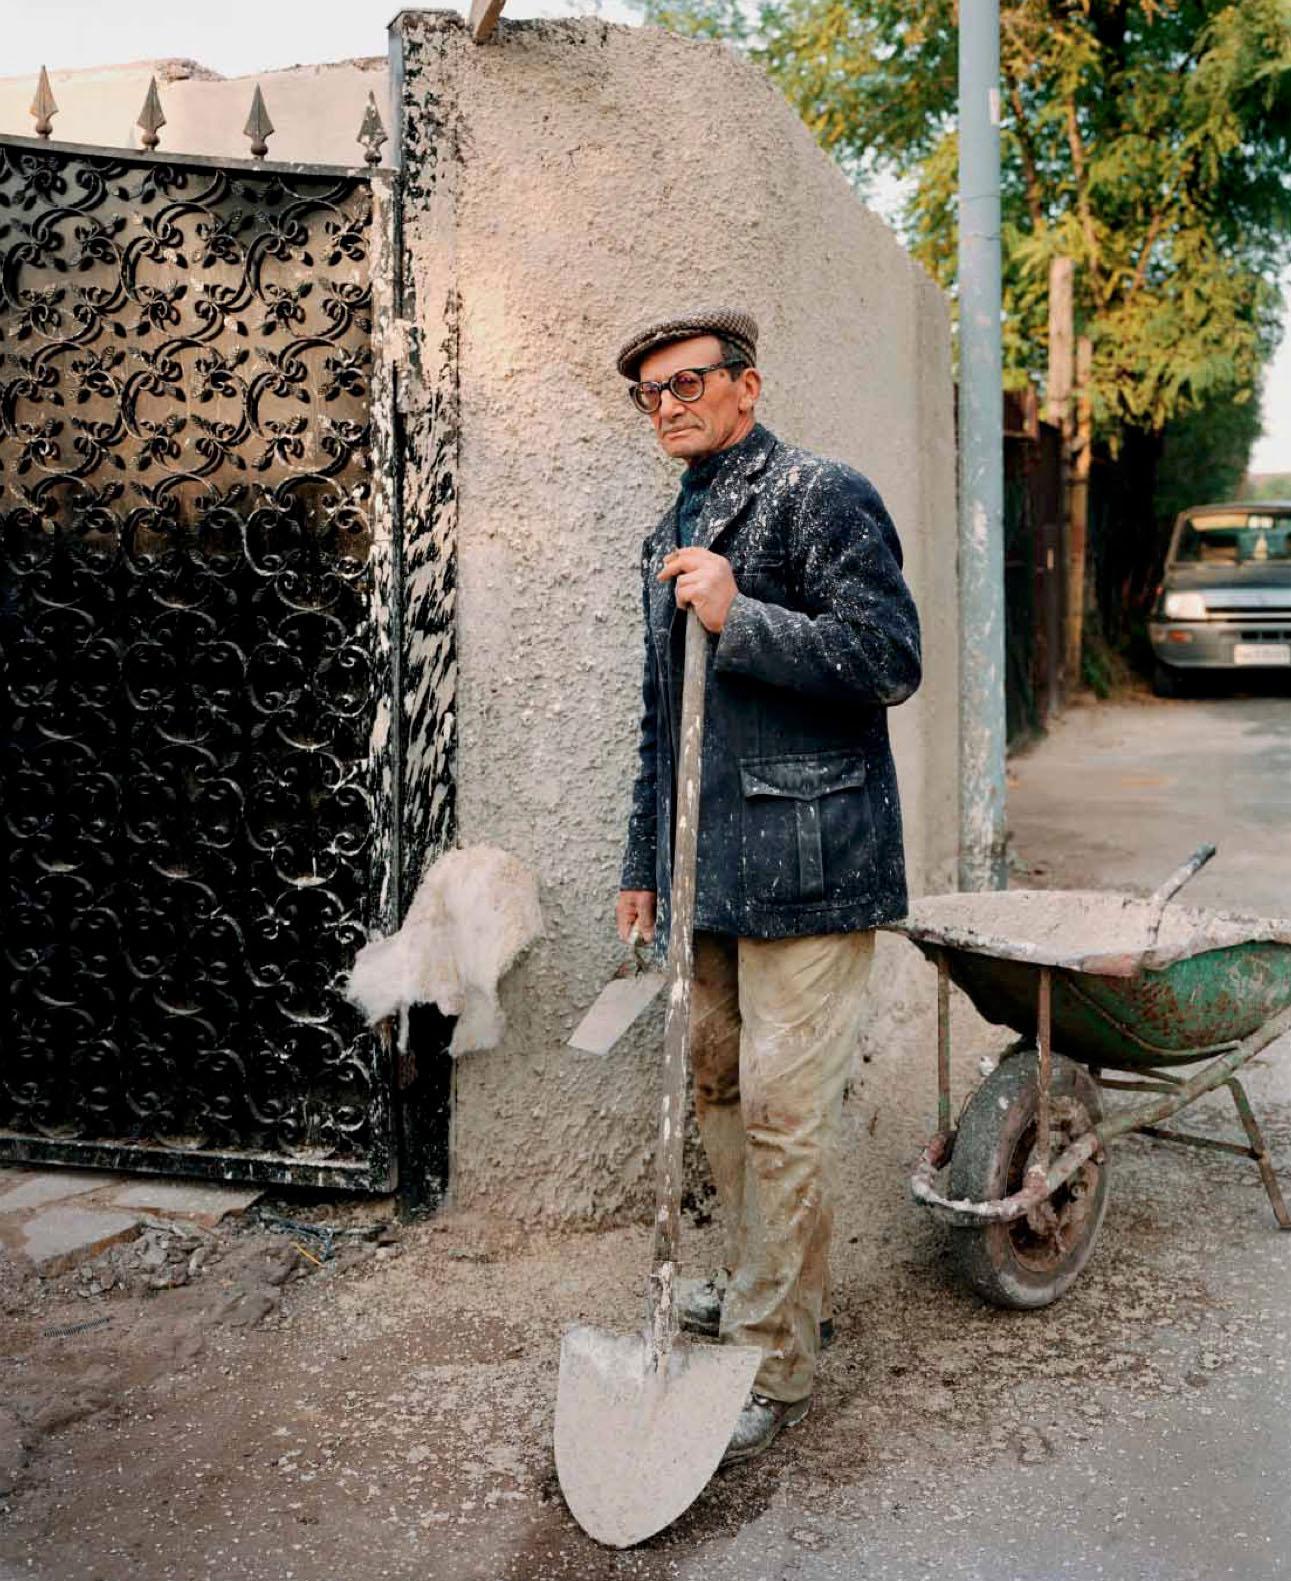 A man at work, near Via Appia Nuova, Frattocchie, November 1990